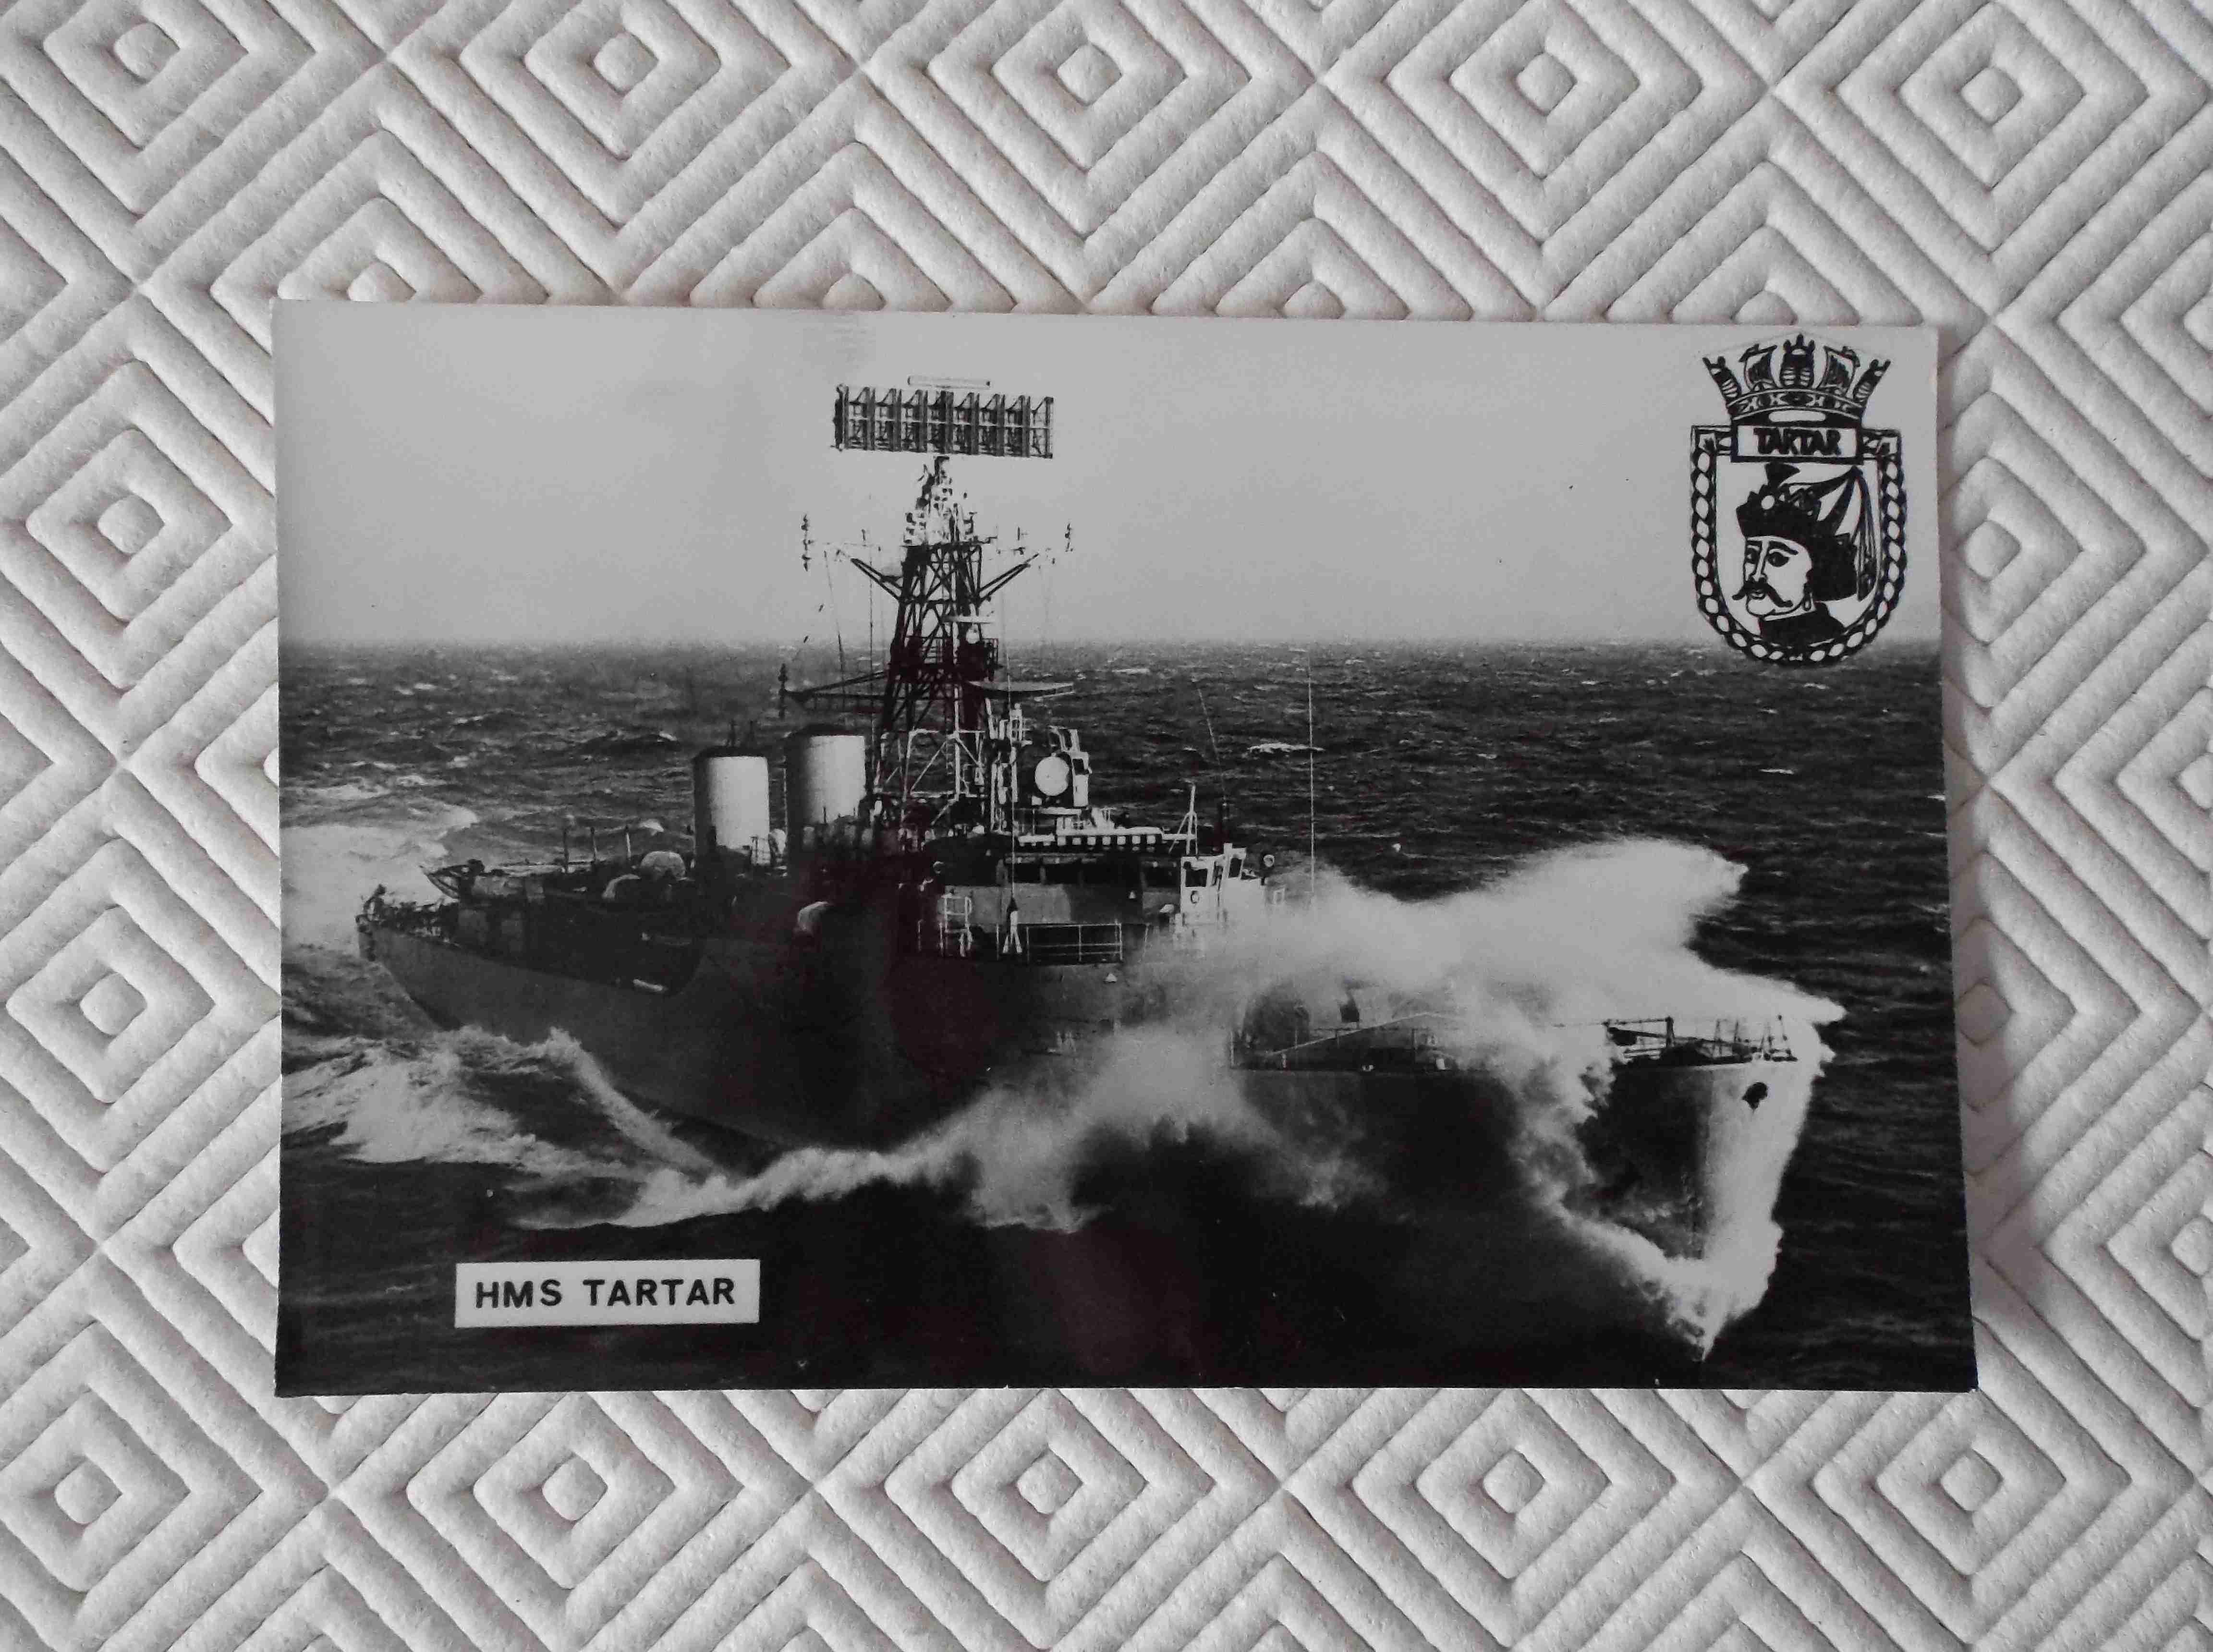 POSTCARD SIZE PHOTOGRAPH OF THE ROYAL NAVAL VESSEL HMS TARTAR